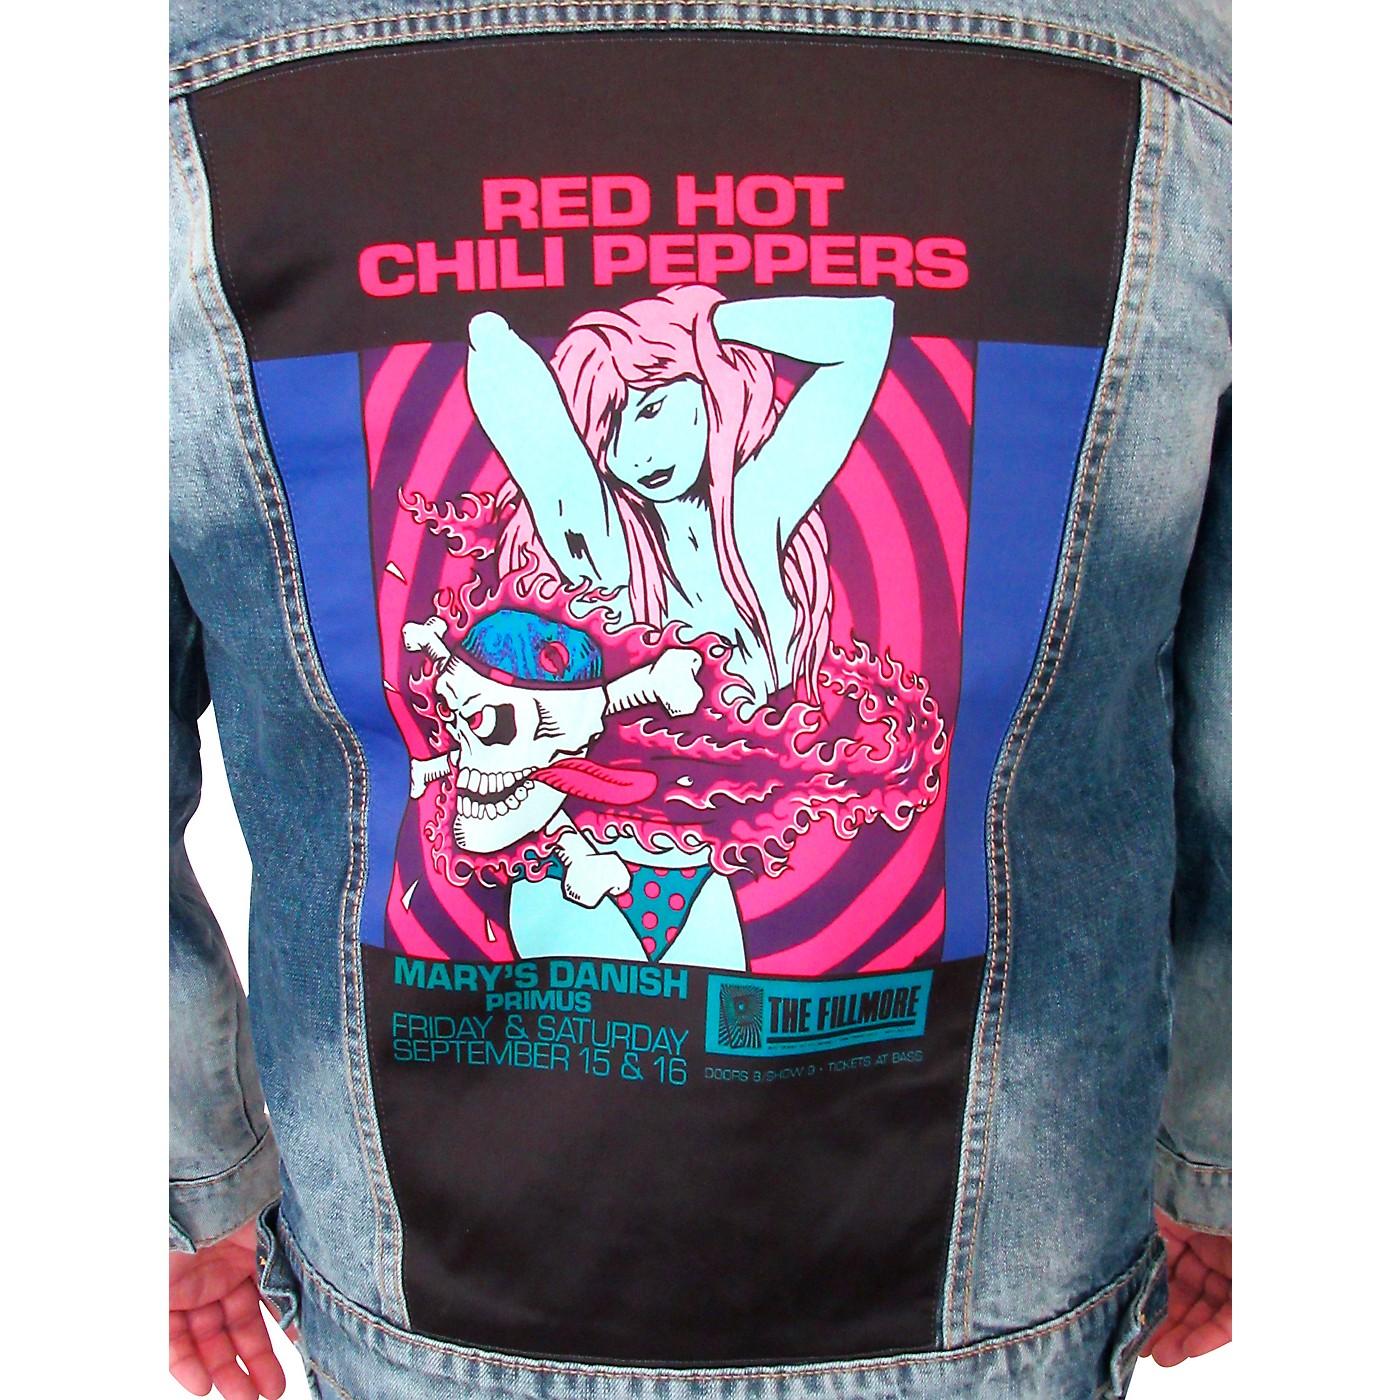 Dragonfly Clothing Red Hot Chili Peppers - Bikini Girl - Mens Denim Jacket thumbnail